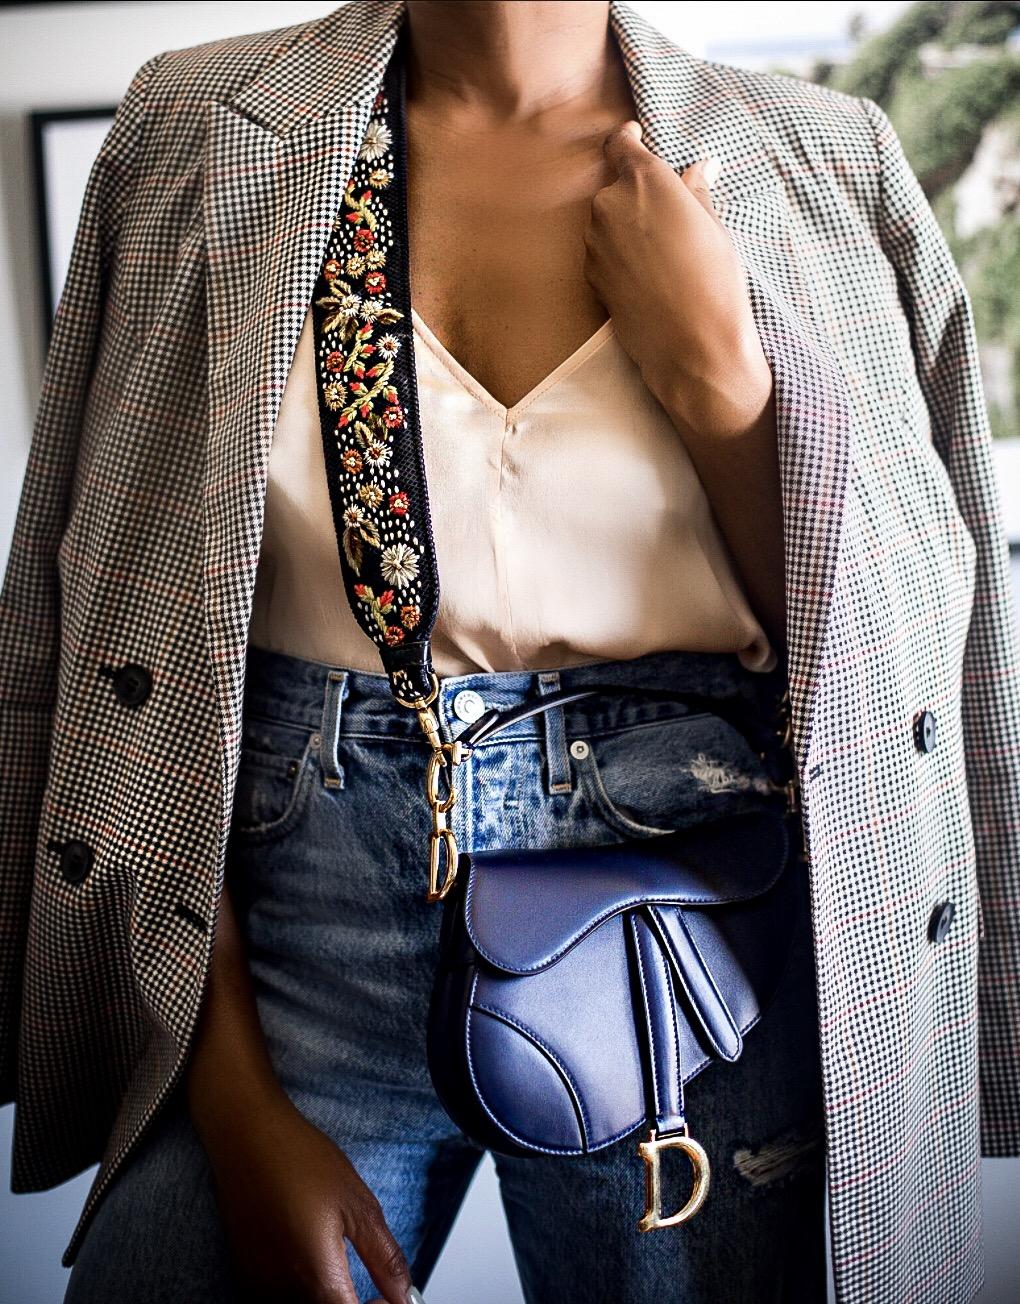 New Dior saddle bag unboxing